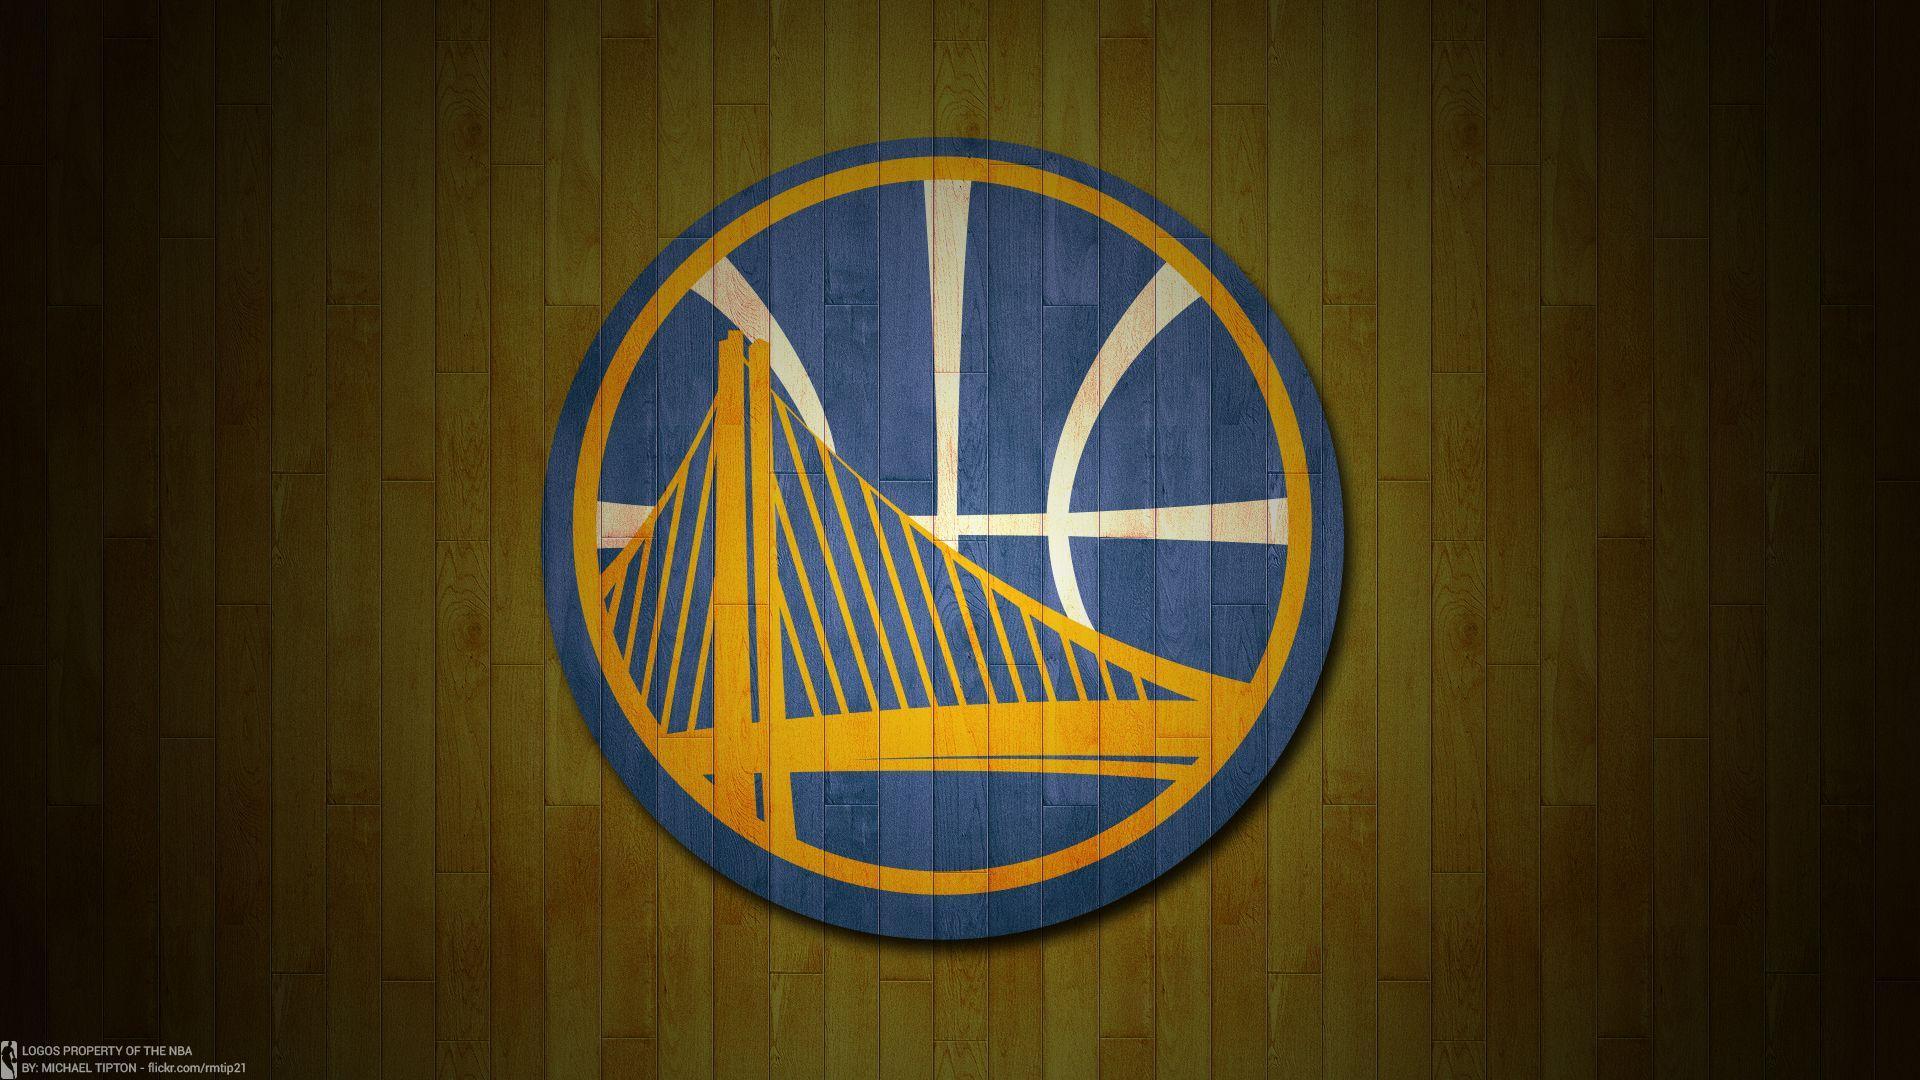 Golden State Warriors 2017 Wallpapers Wallpaper Cave